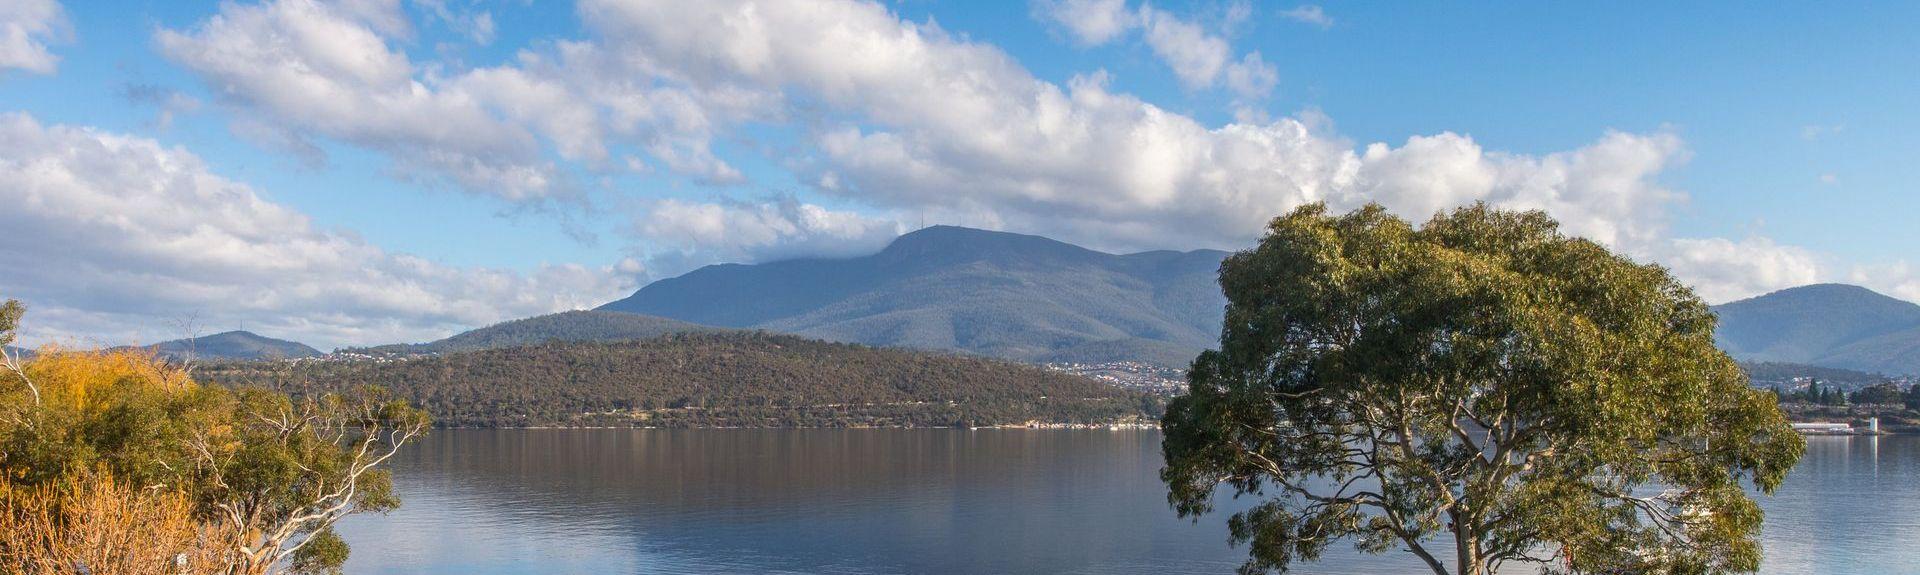 South Hobart, Hobart, Tasmania, Australia